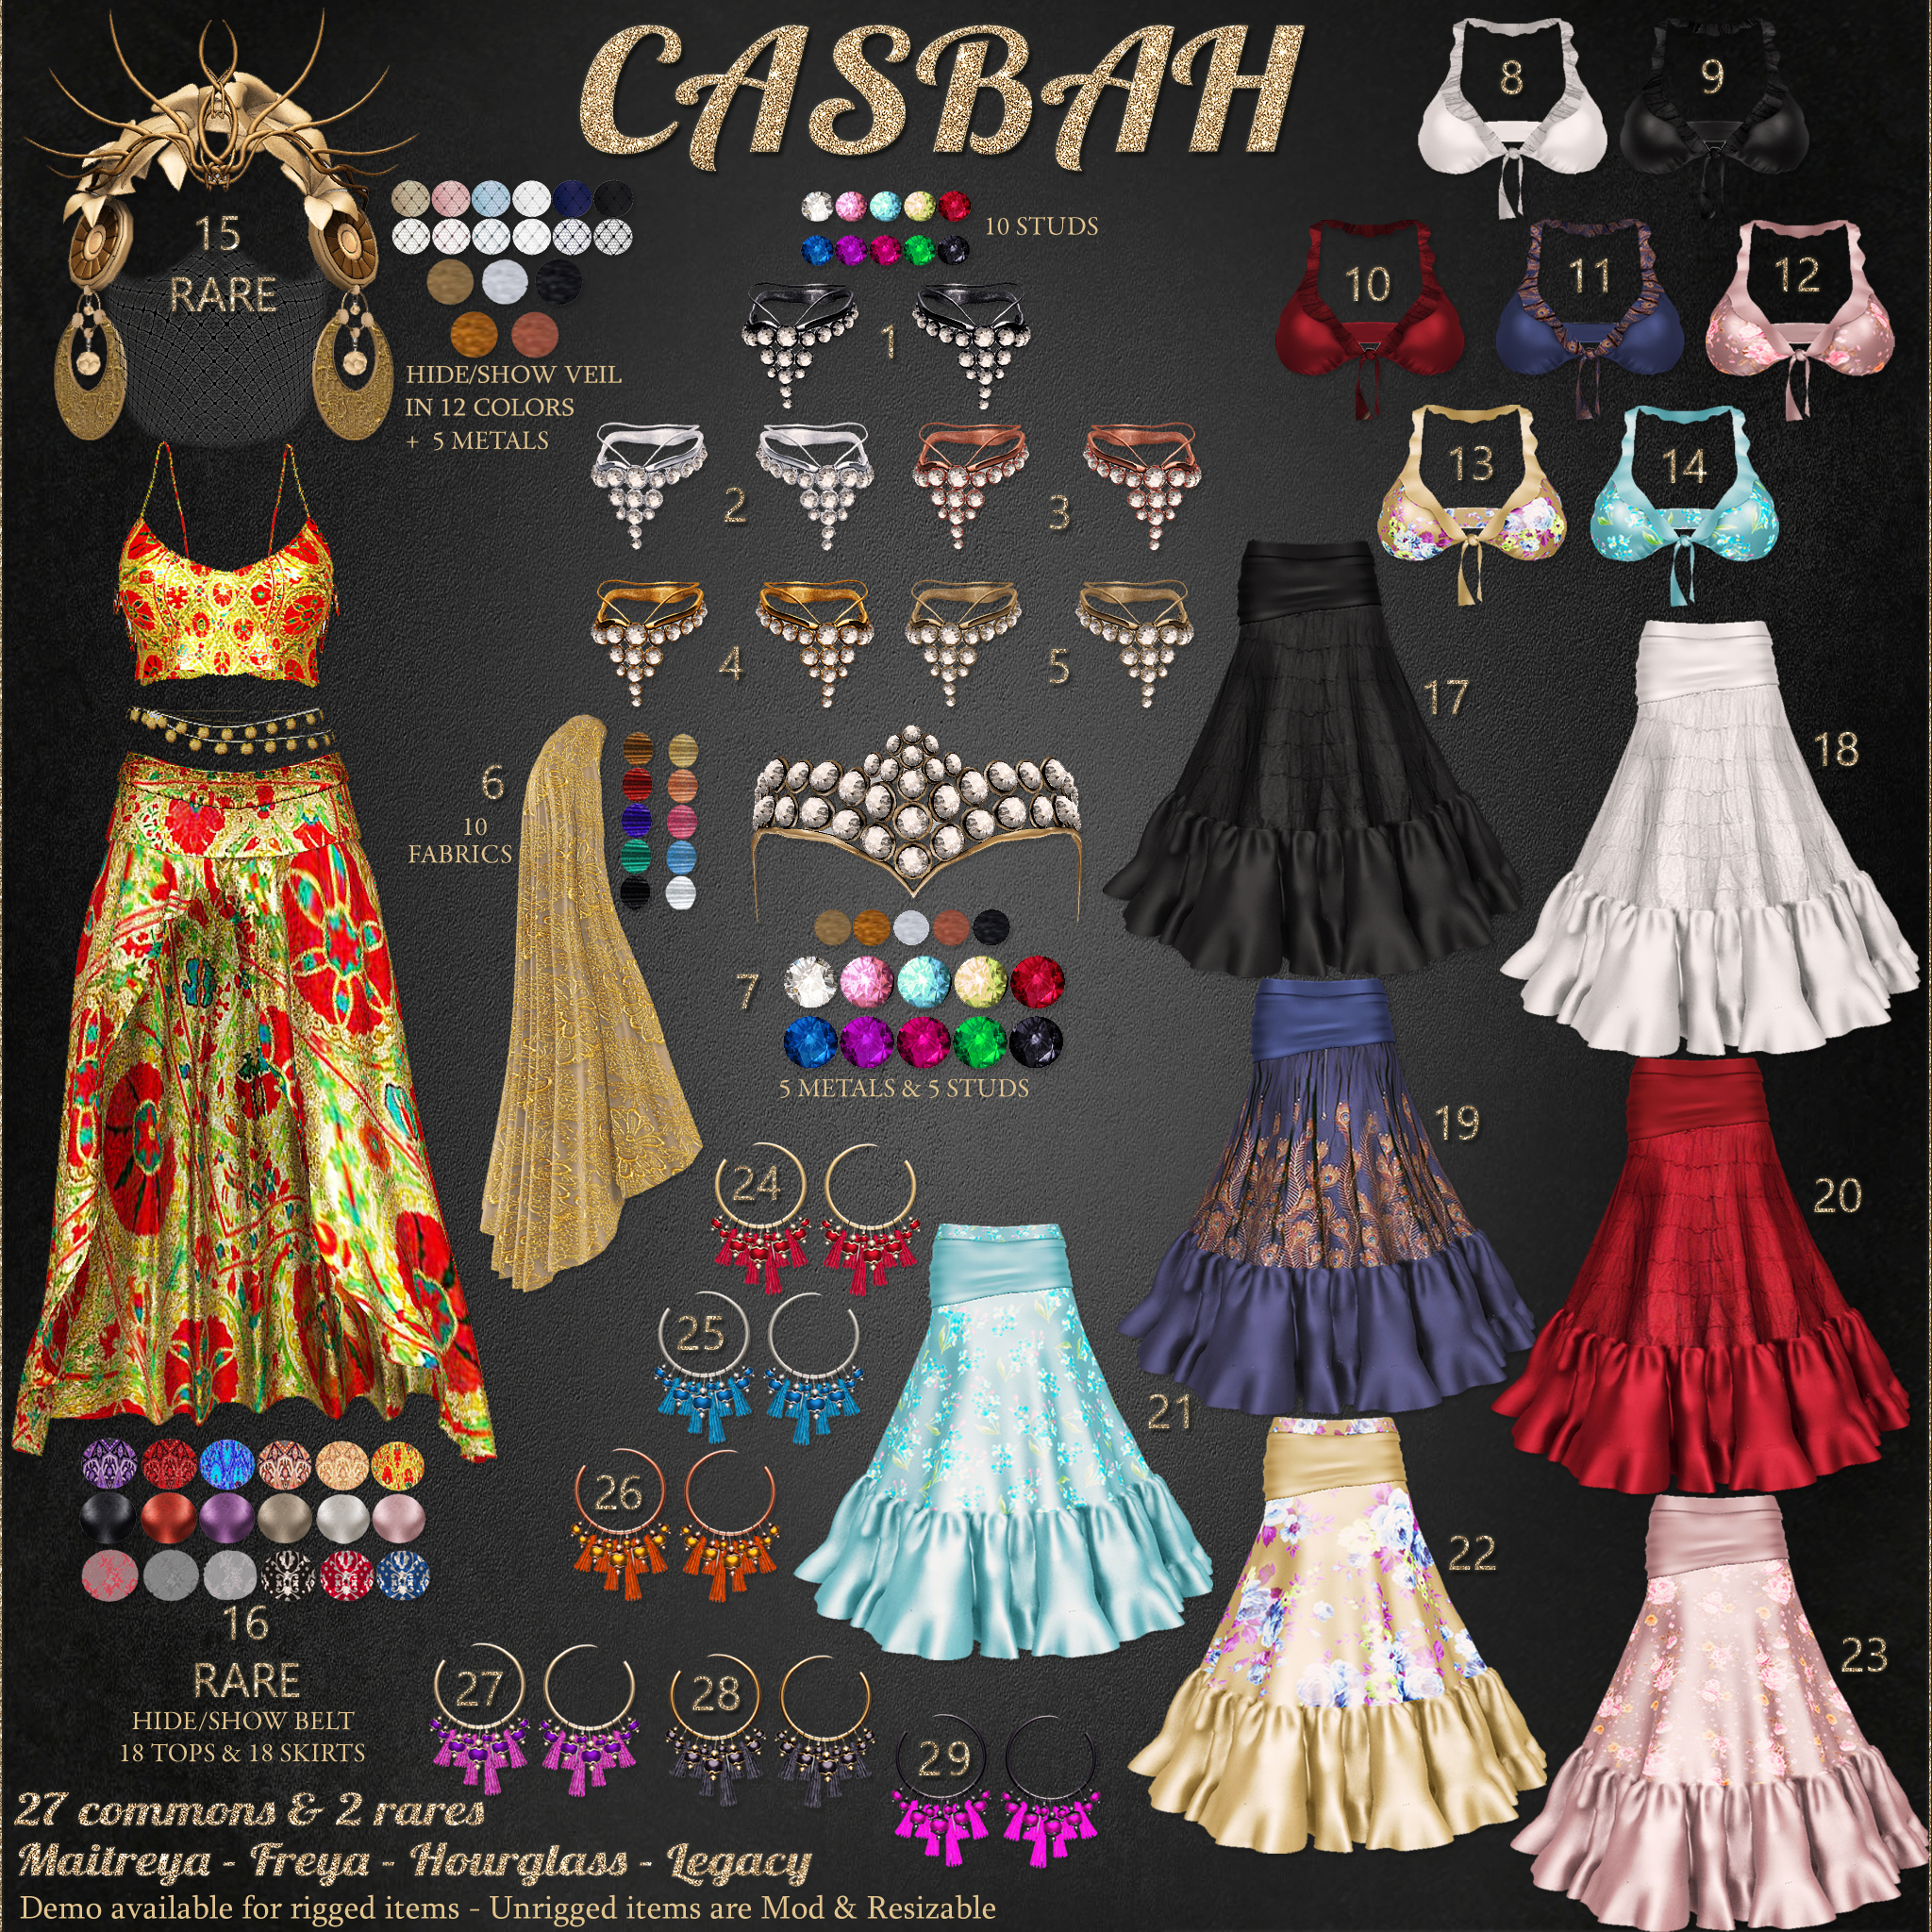 Baiastice_Casbahl-Gacha key2.jpg